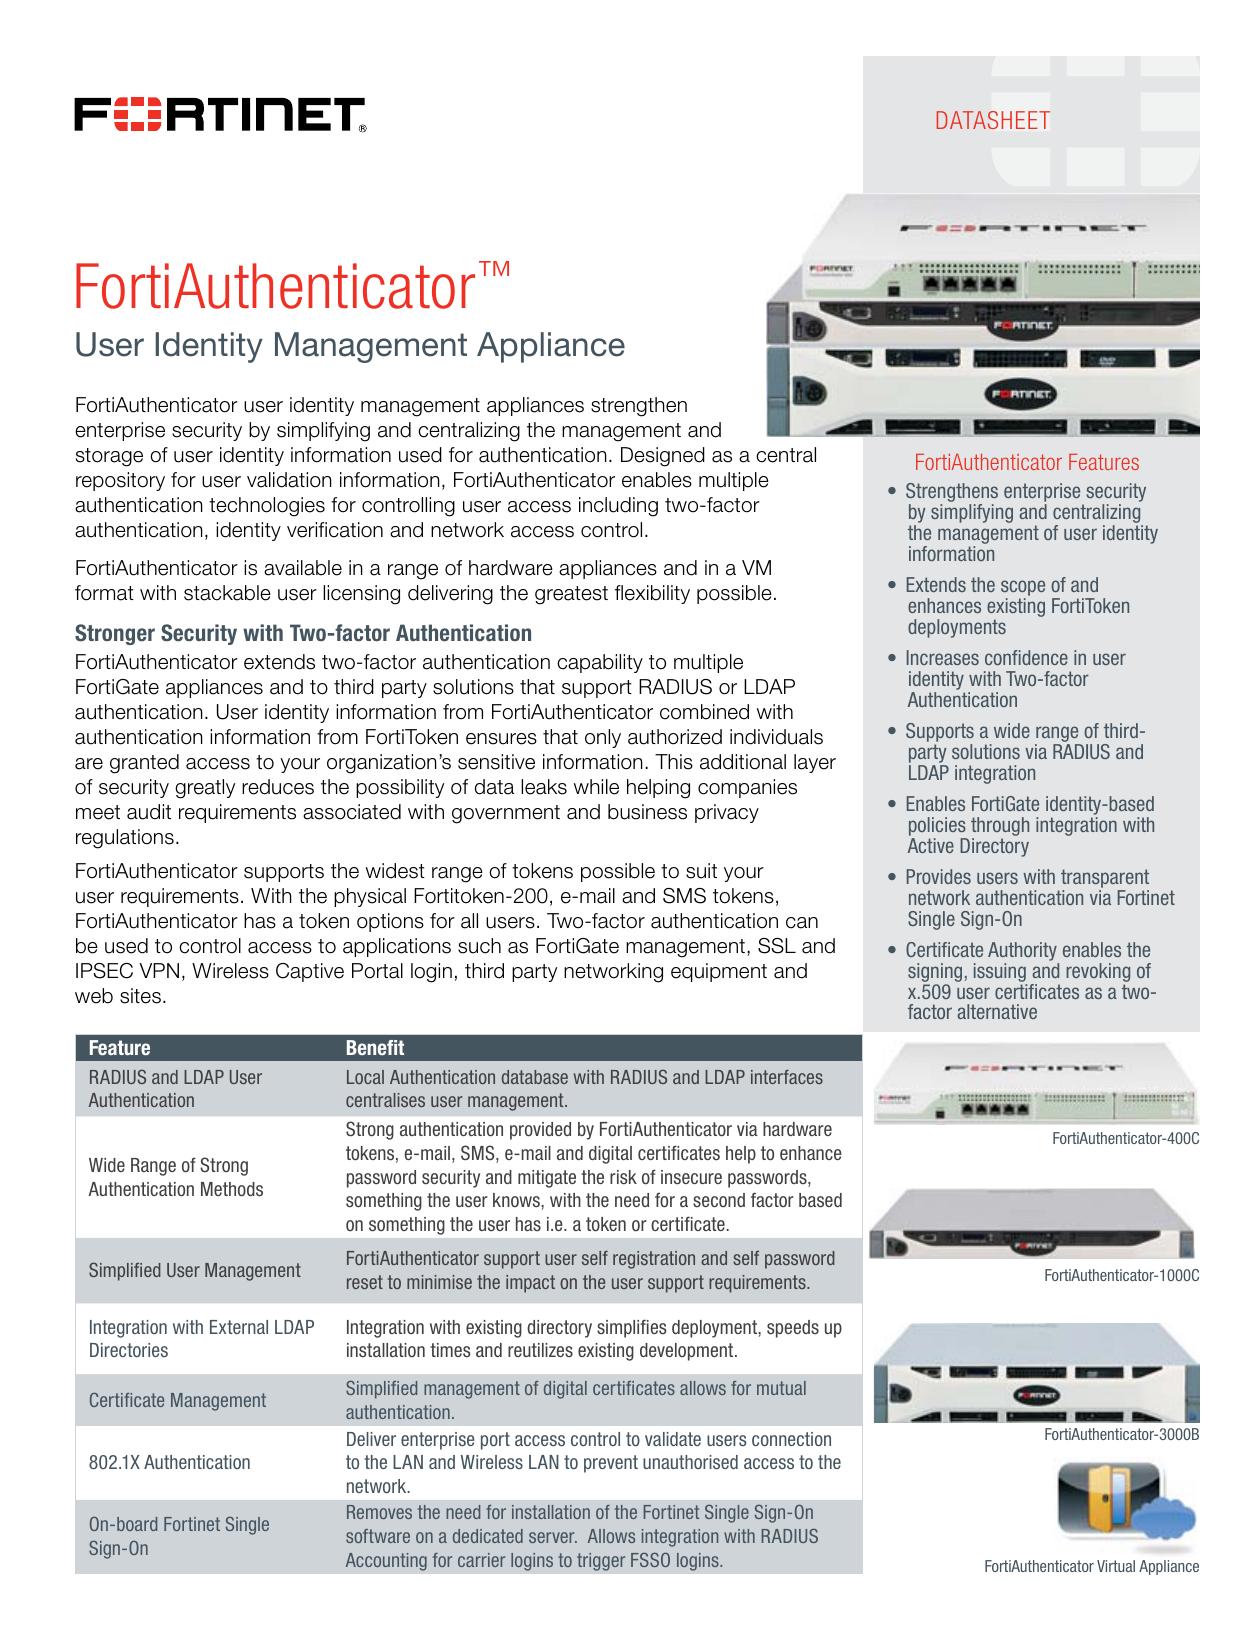 FortiAuthenticator Datasheet | manualzz com